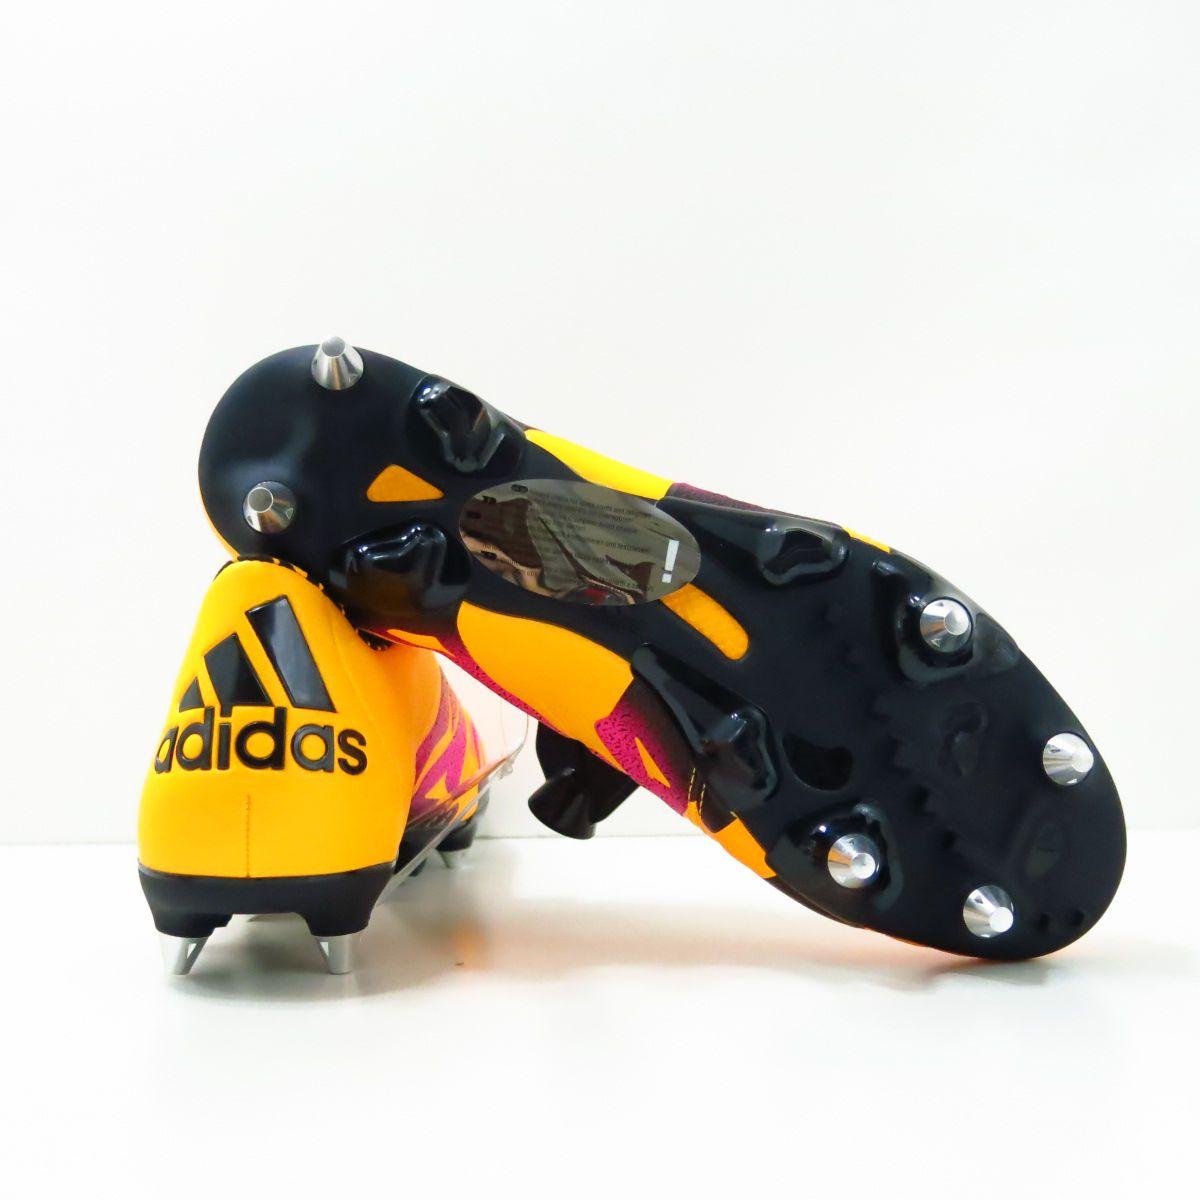 Chuteira Adidas X 15.1 SG - Trava Mista Couro de Canguru